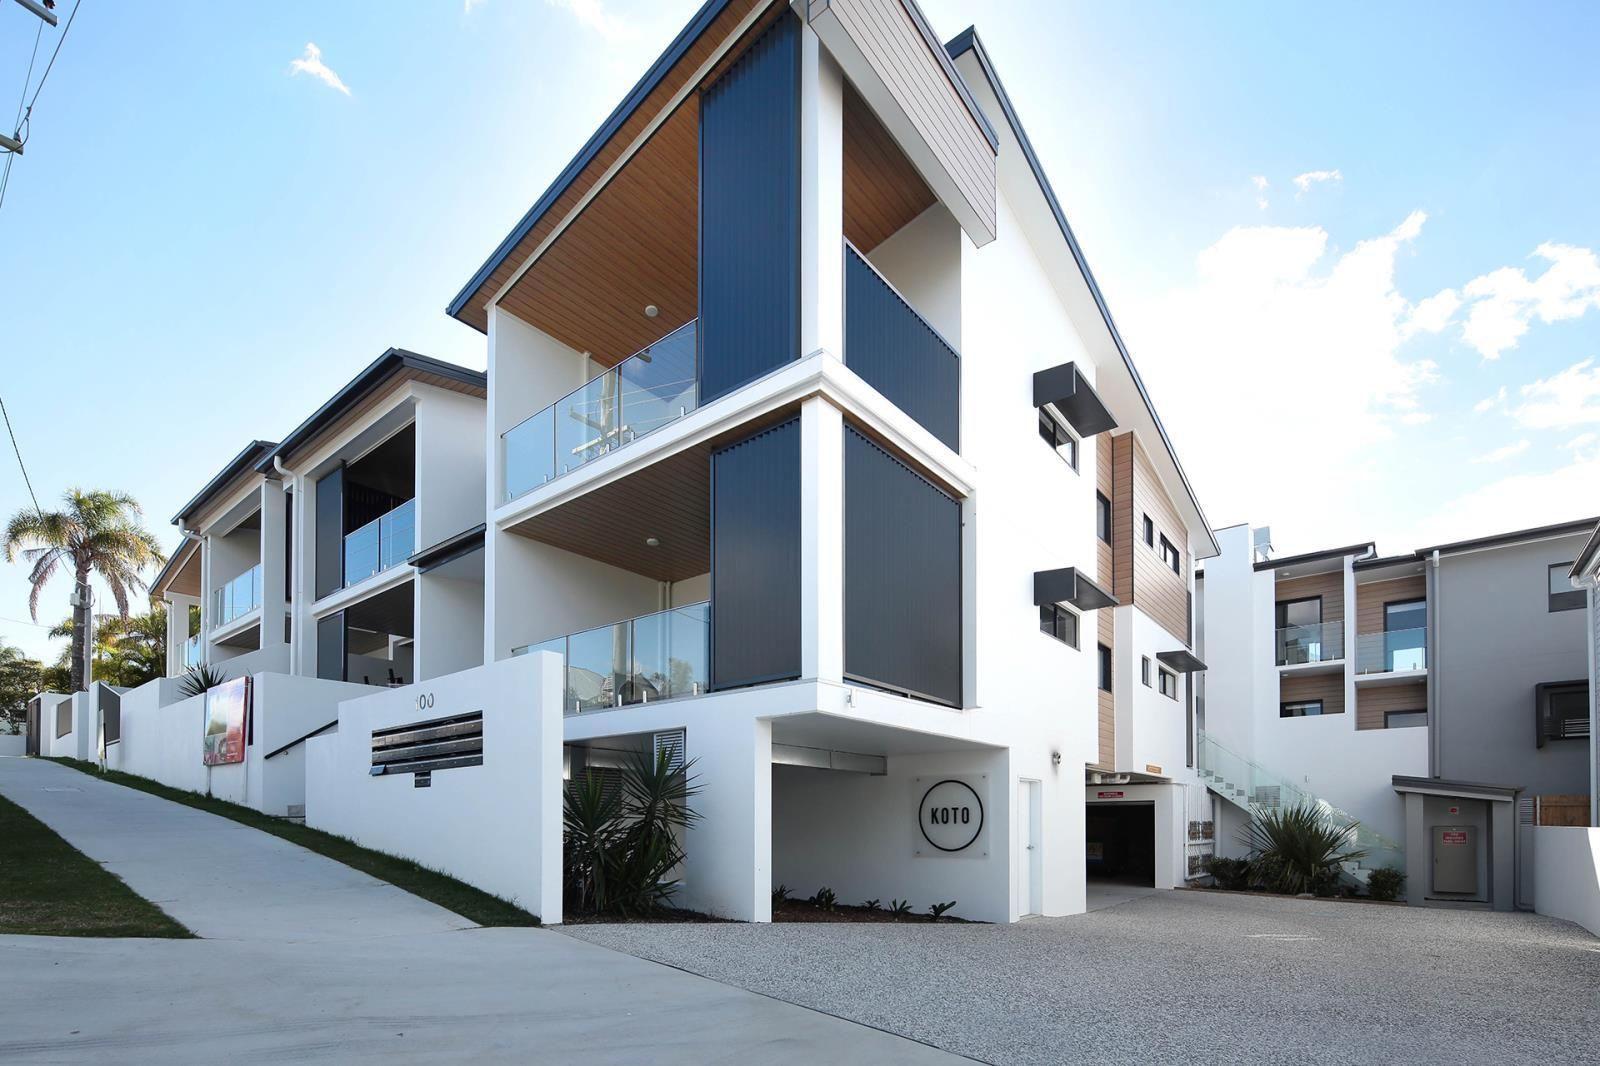 17/100 Monmouth Street, Morningside QLD 4170, Image 0